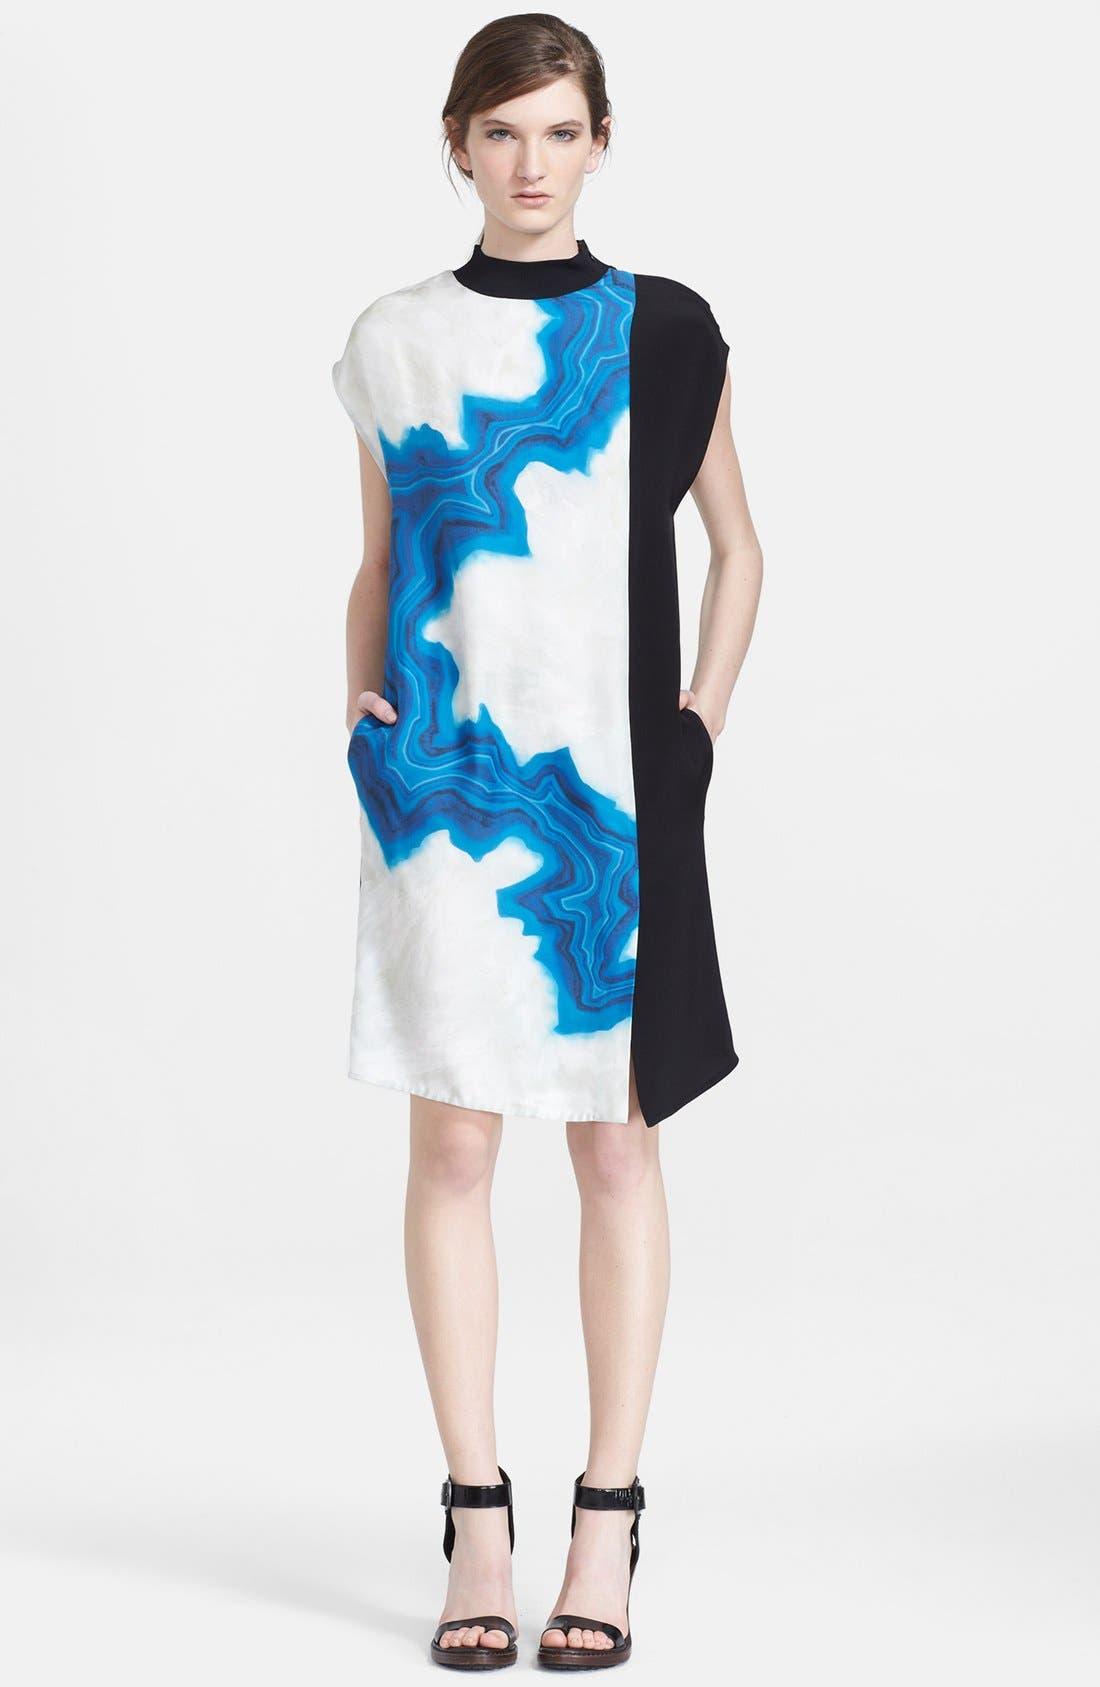 Alternate Image 1 Selected - 3.1 Phillip Lim Geode Print Colorblock Shift Dress